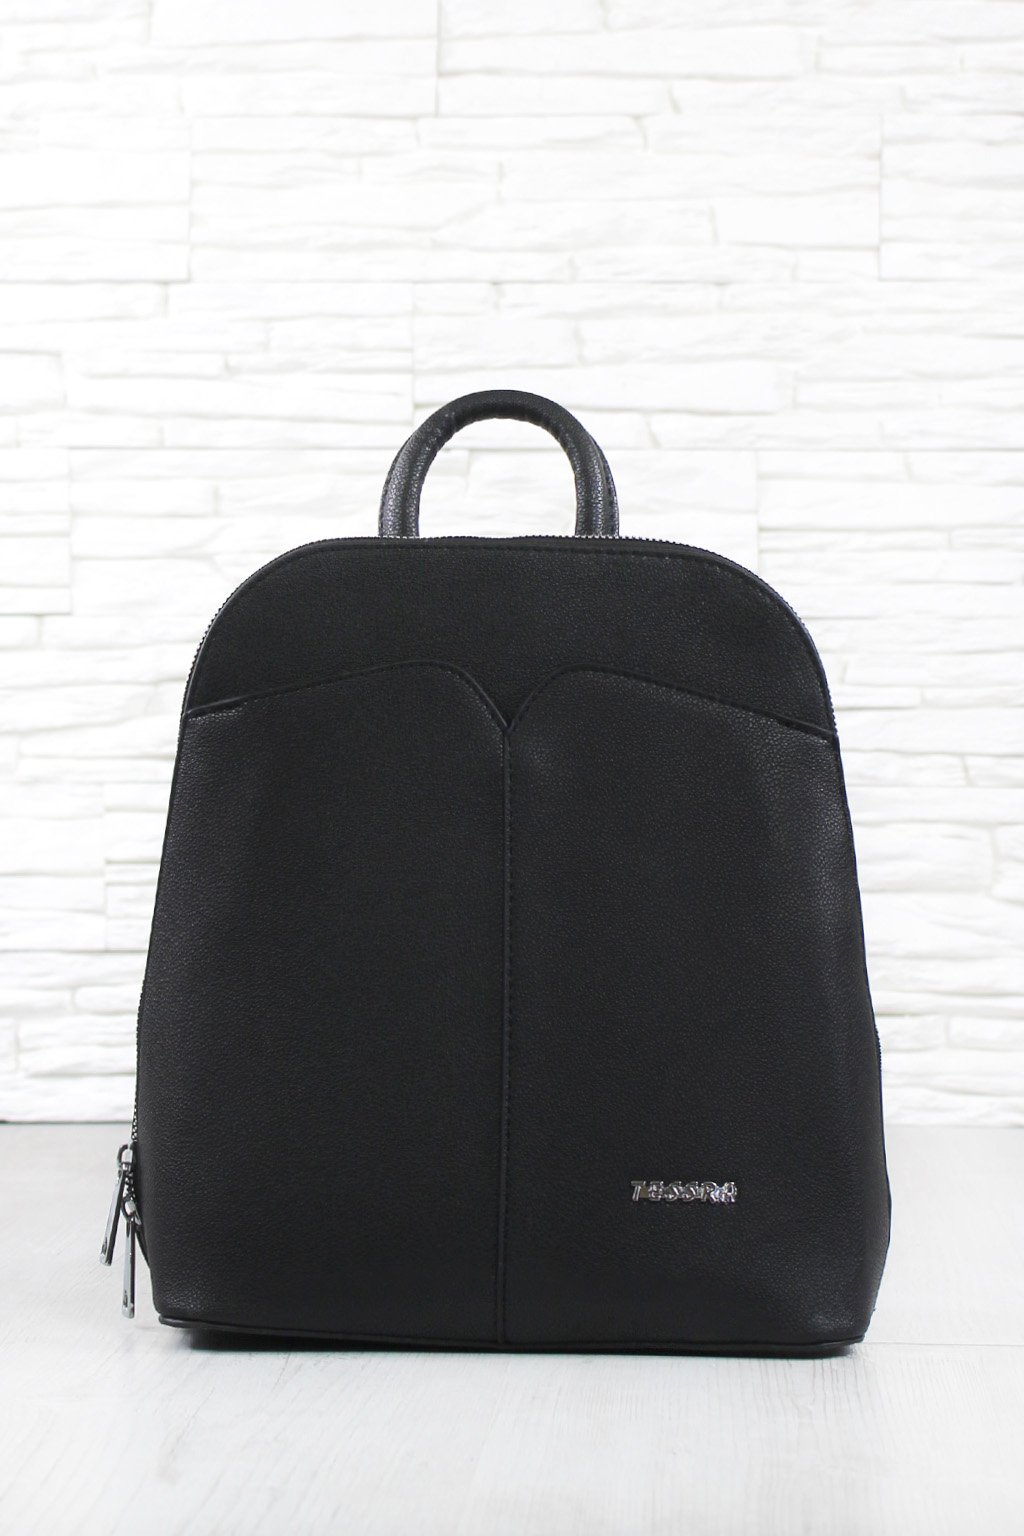 Dámský batoh 5452 ts (2)